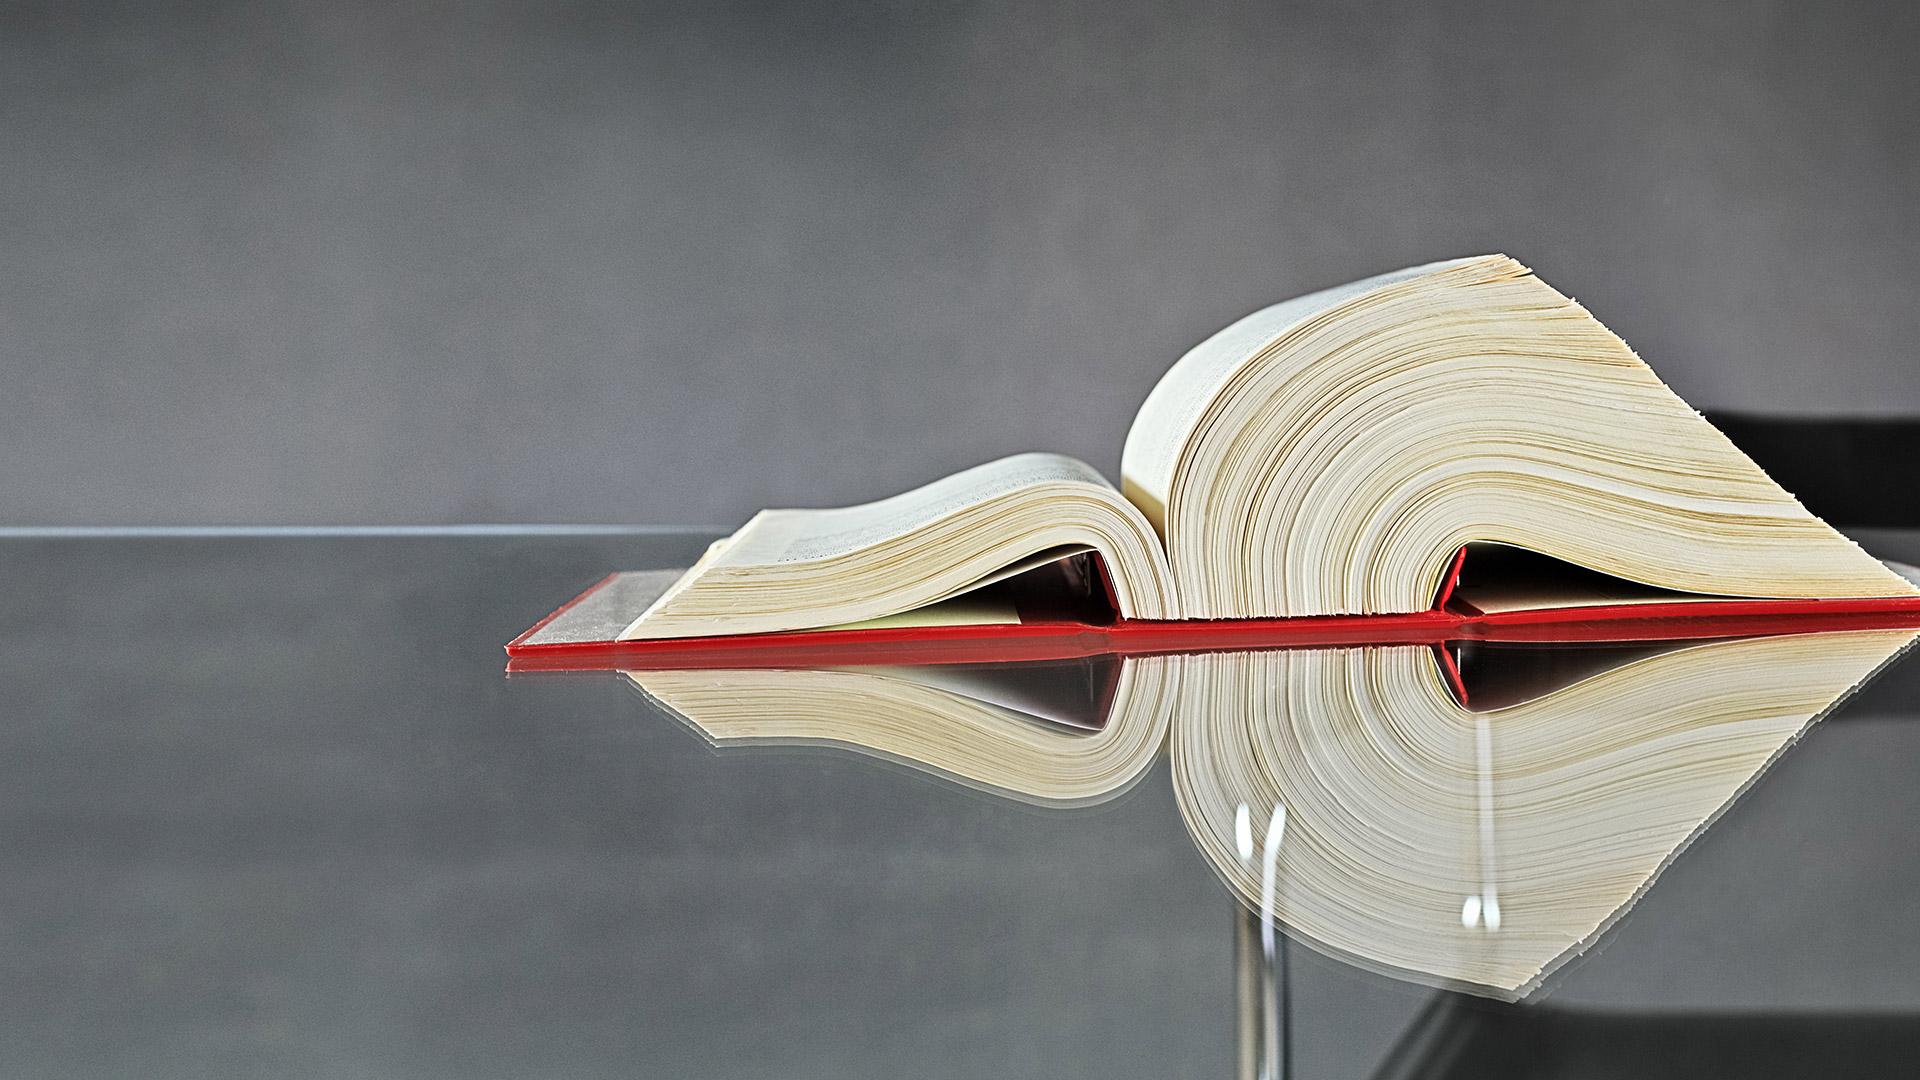 Large book on glass desk